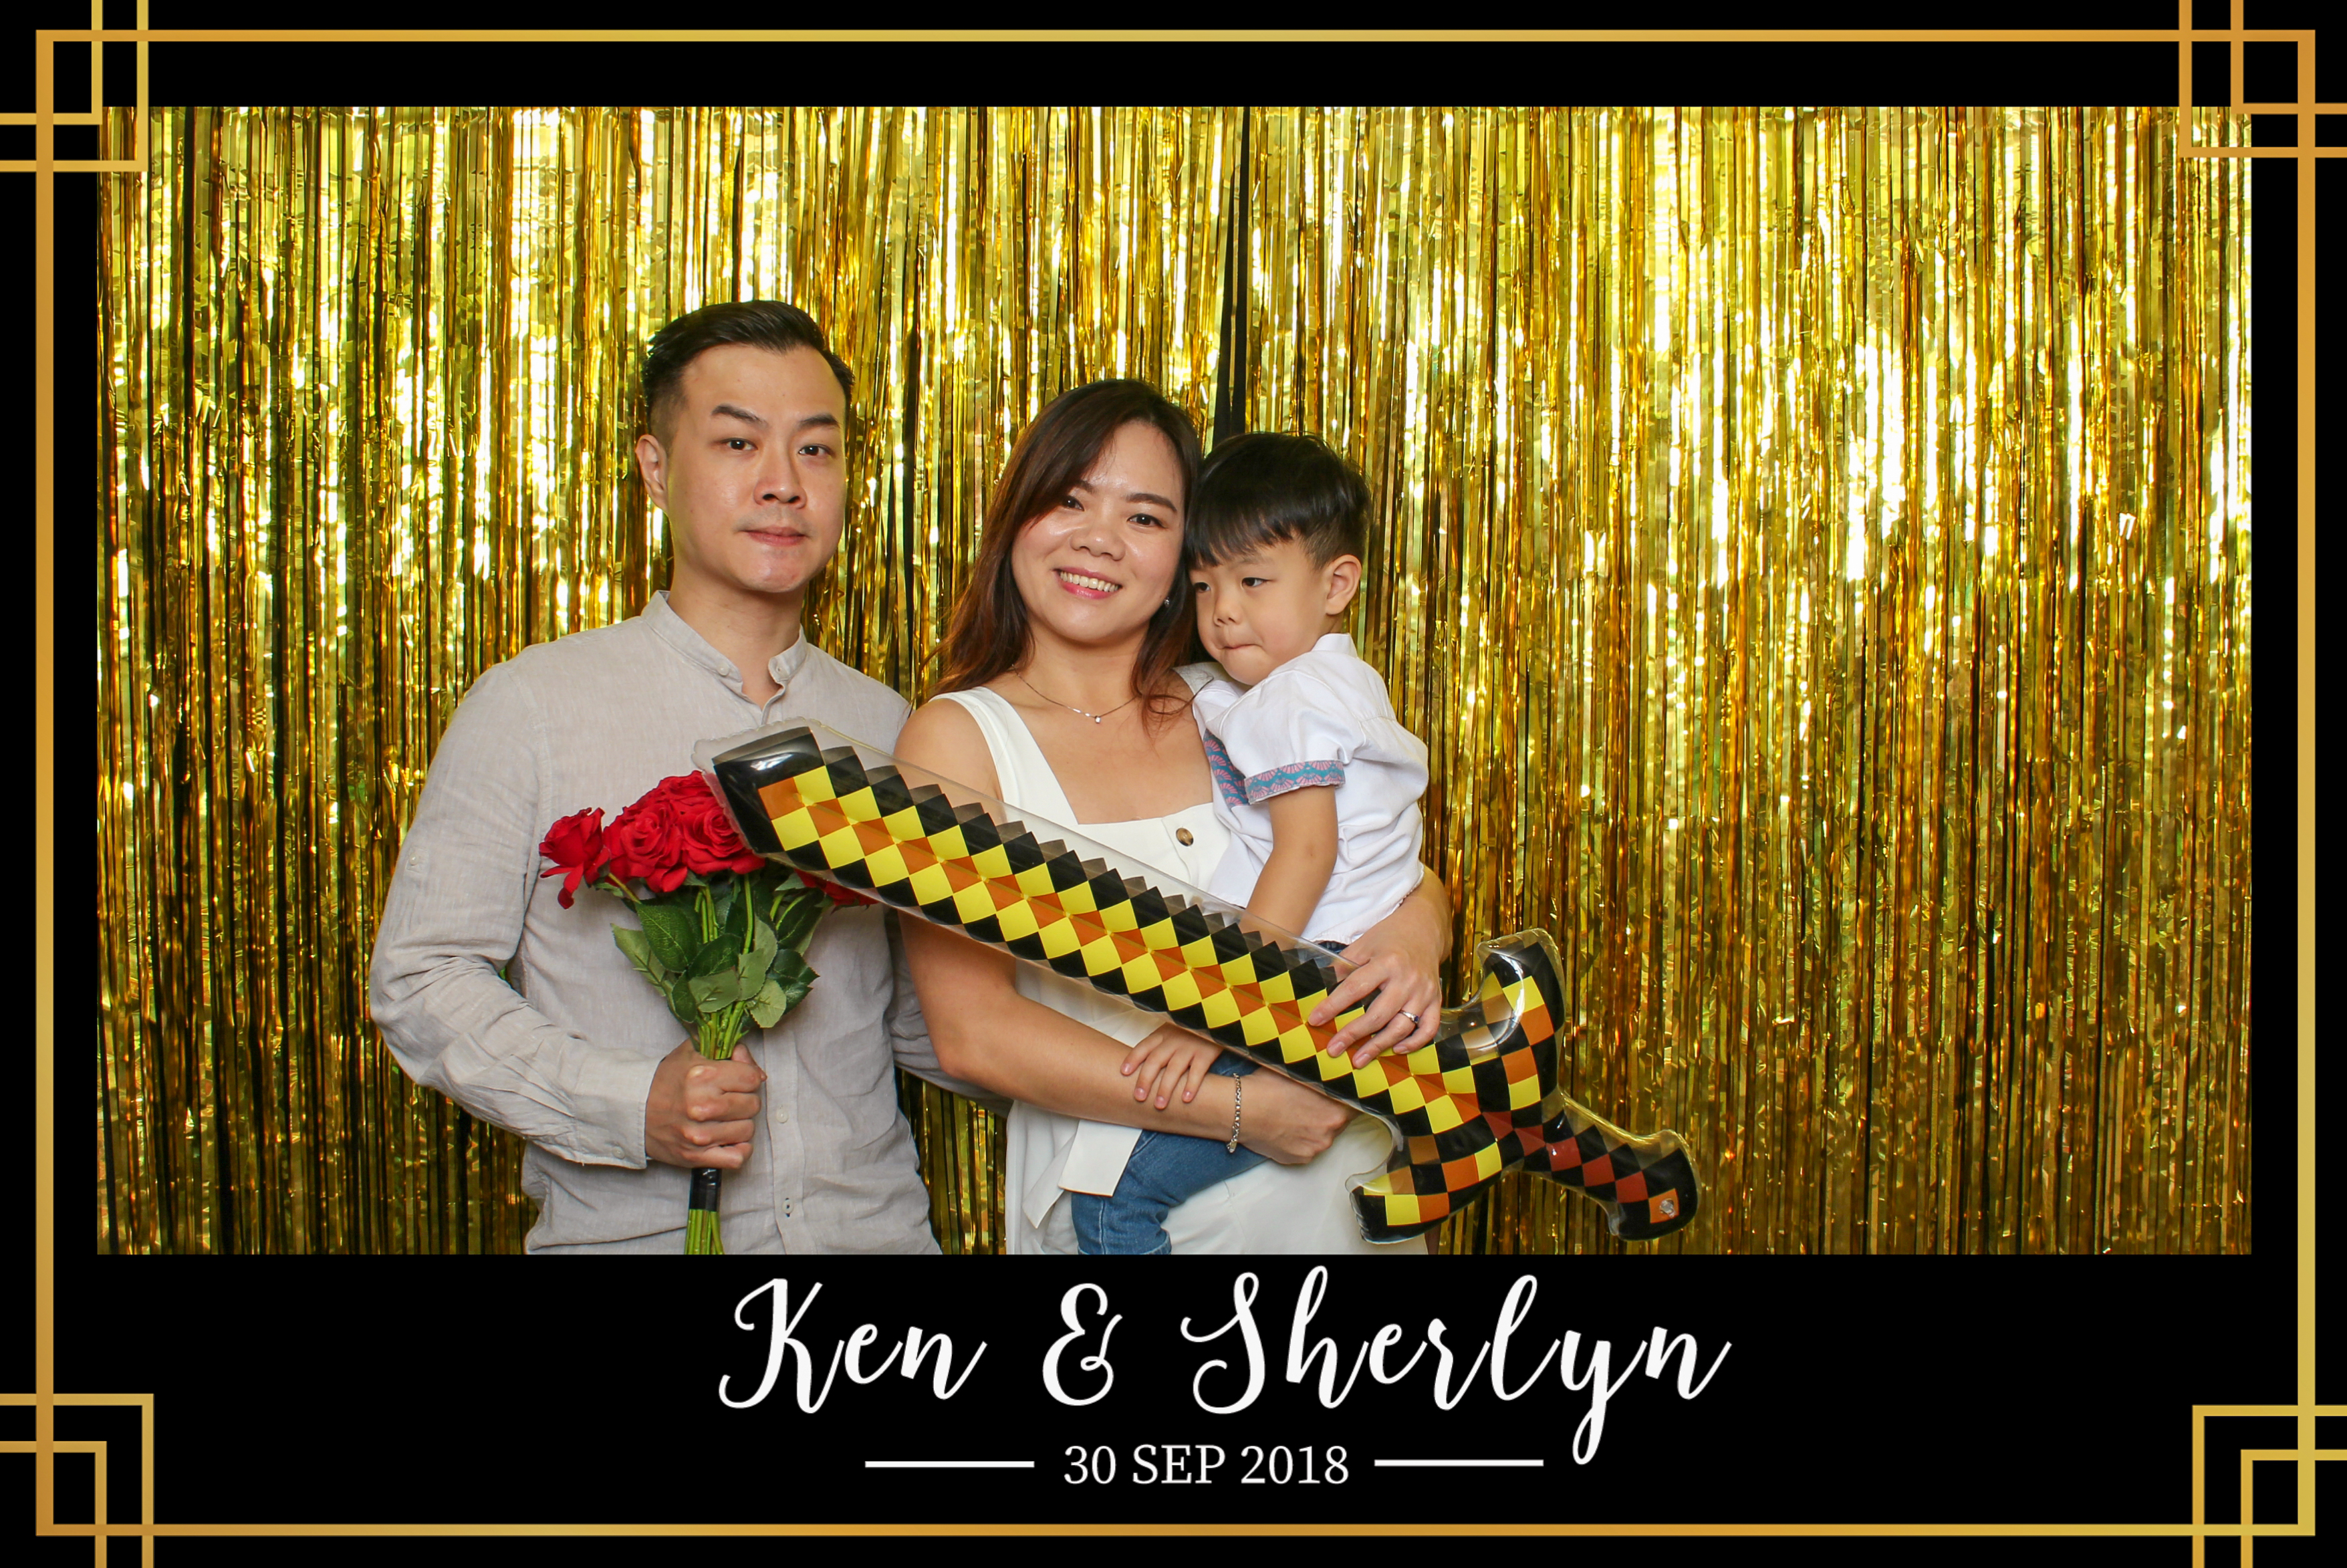 Ken Sherlyn wedding photo booth (44)